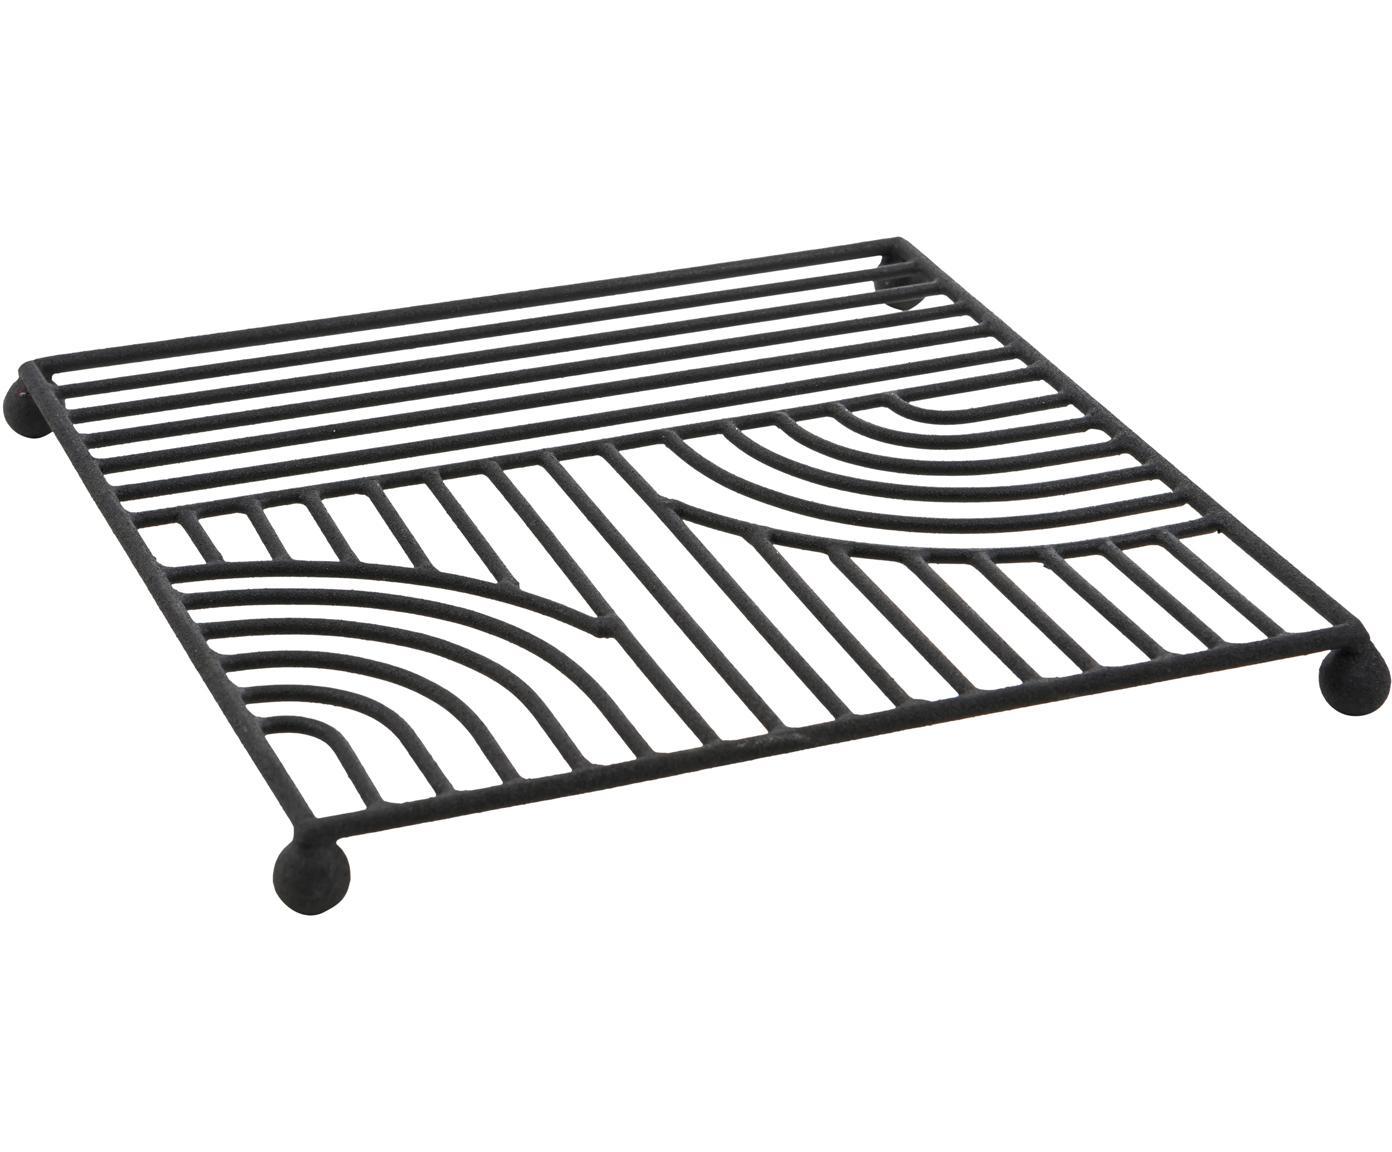 Sottopentola Maze, Metallo verniciato, Nero, Larg. 20 x Lung. 20 cm